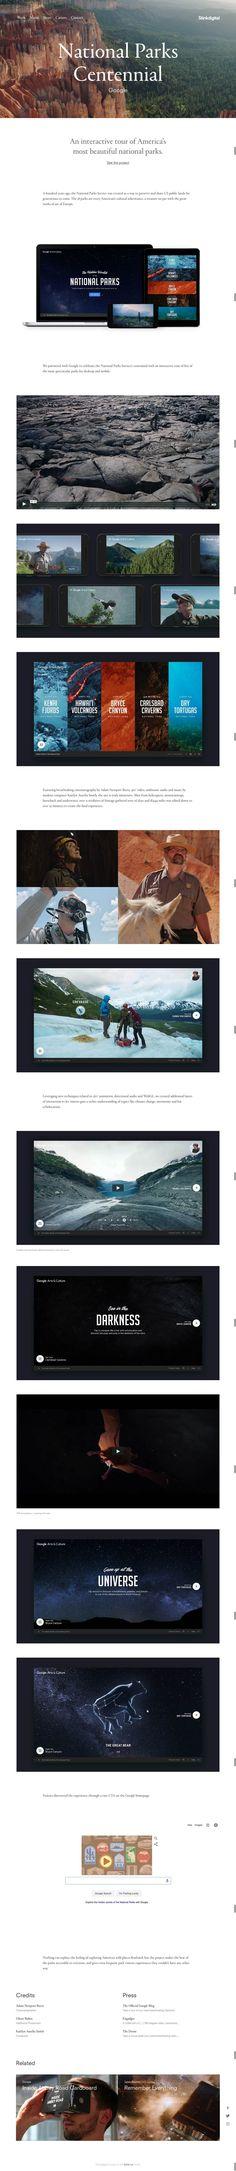 National Parks Centennial — Stink Digital  https://artsandculture.withgoogle.com/en-us/  http://www.stinkdigital.com/work/google-the-hidden-worlds-of-the-national-parks